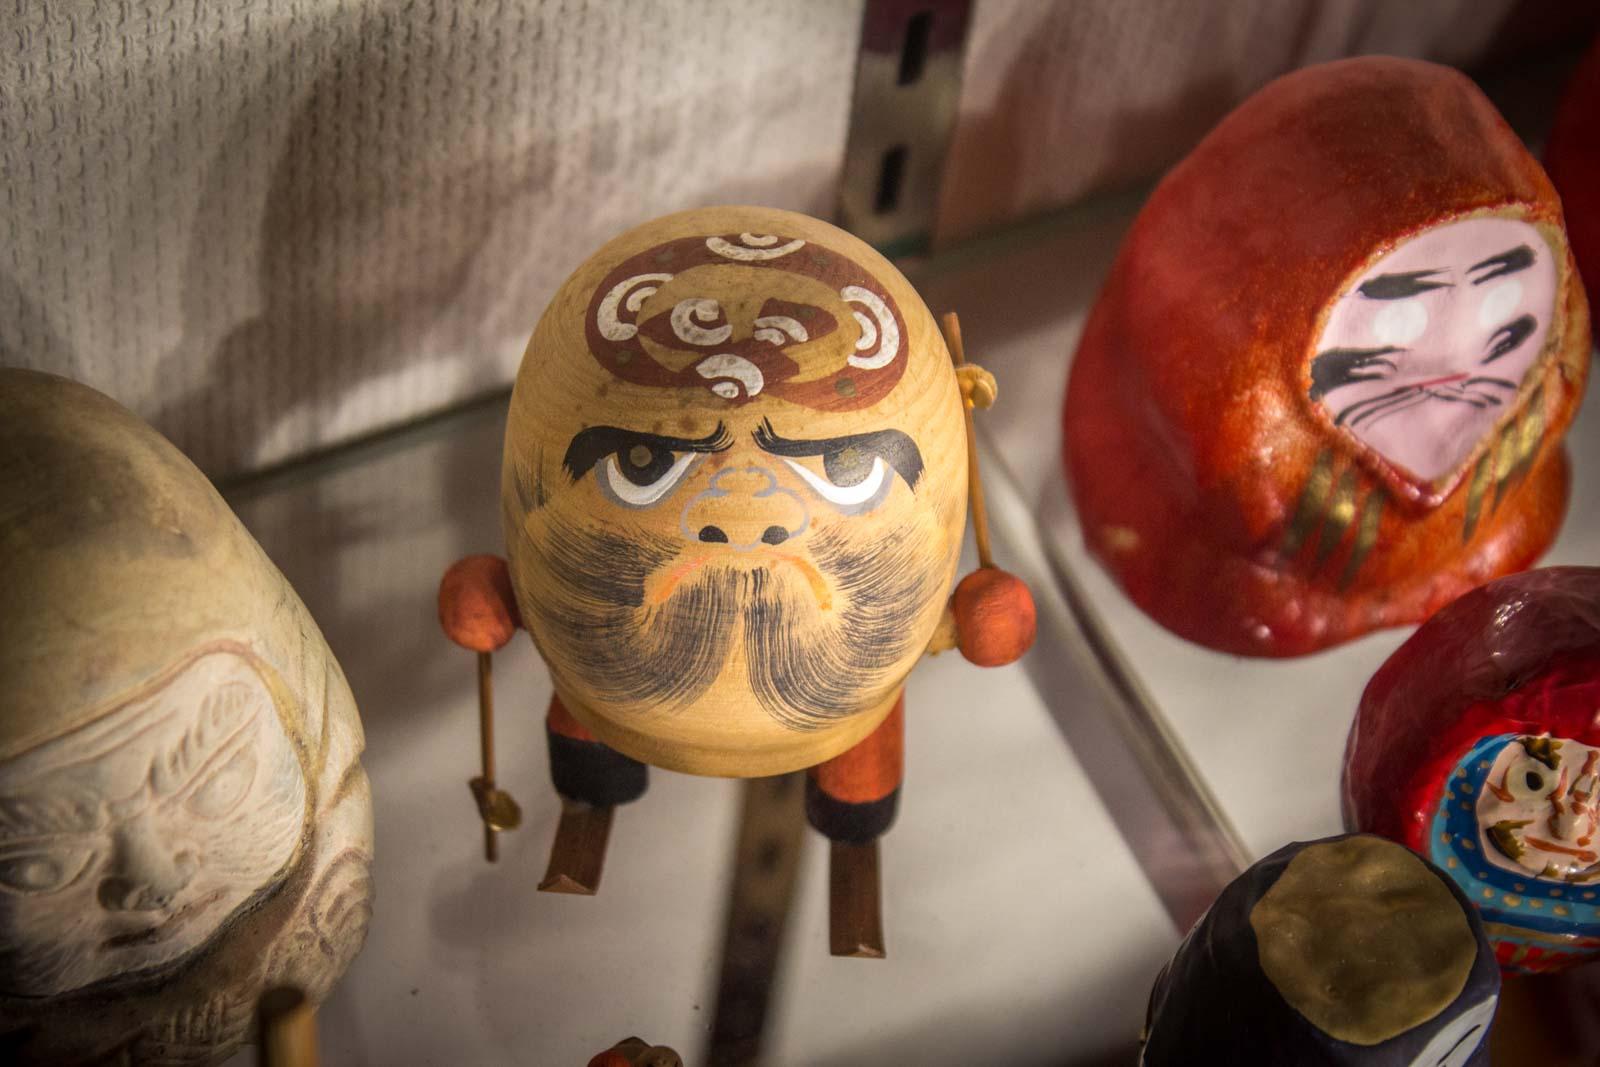 Daruma dolls and the Daruma temple in Takasaki, Japan